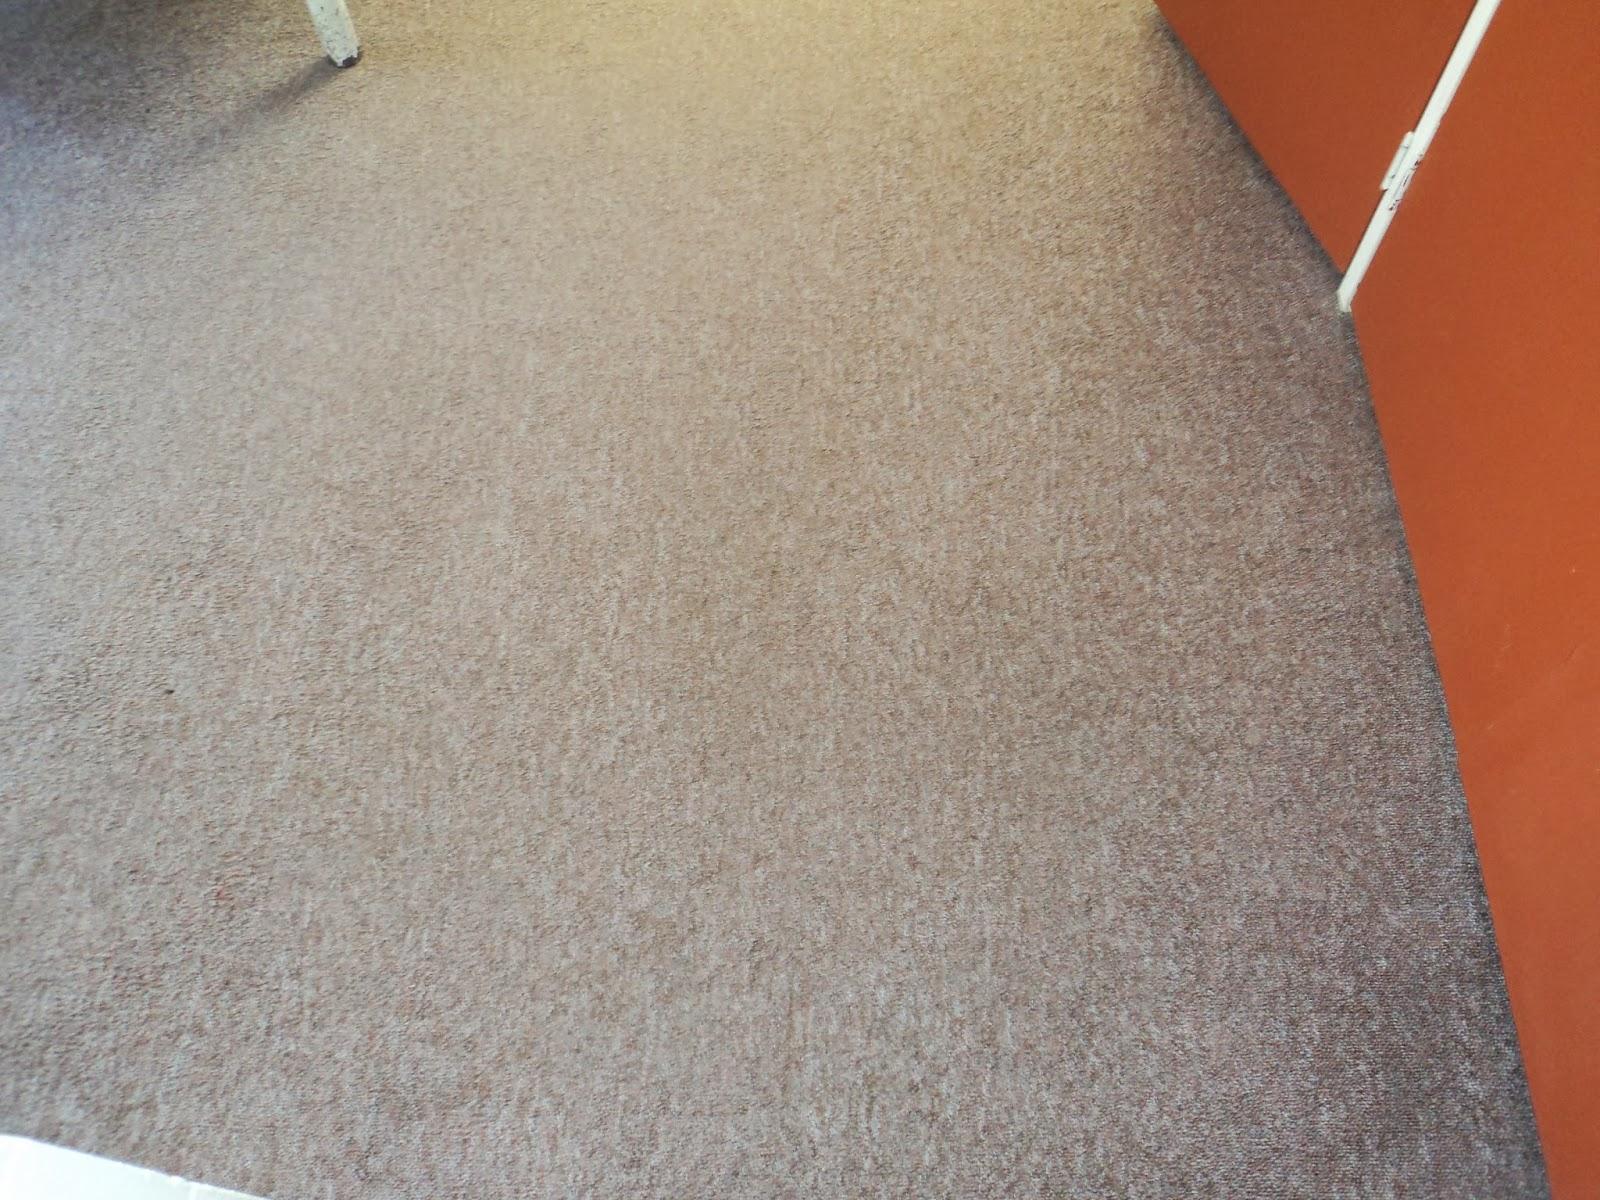 Diamond Carpet Cleaning News 2013